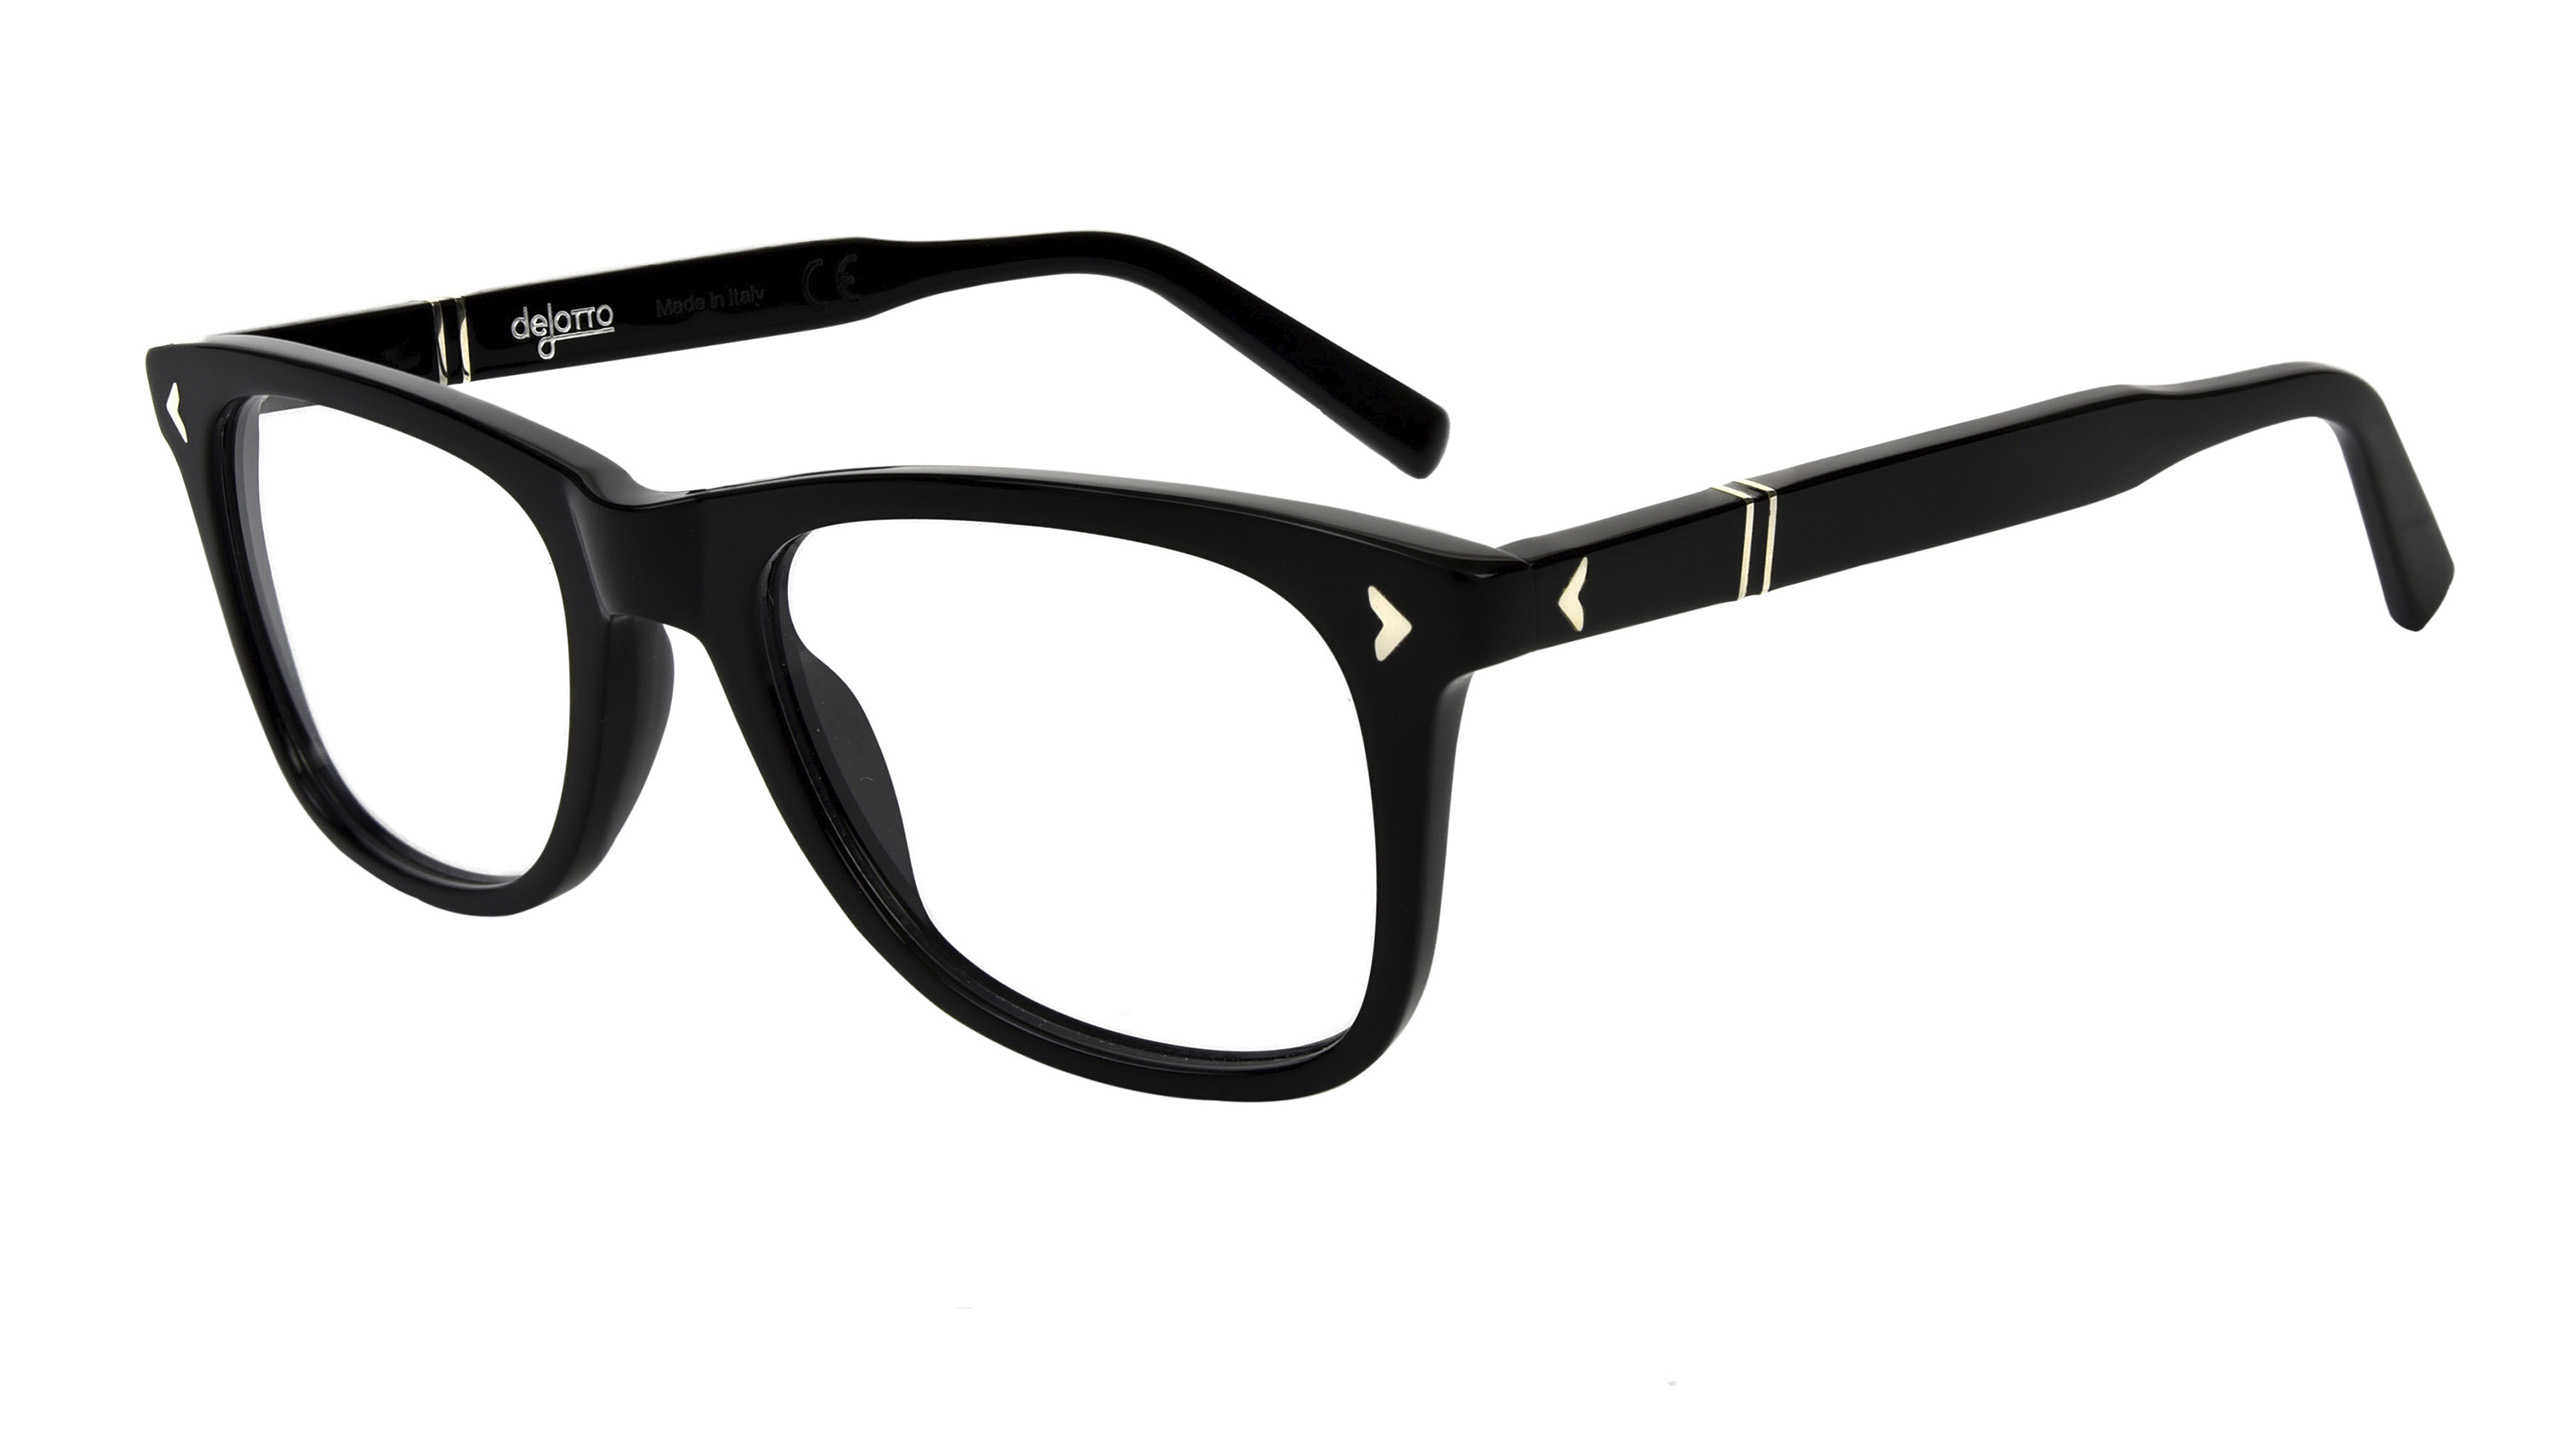 DL 88 c.8001 – Black